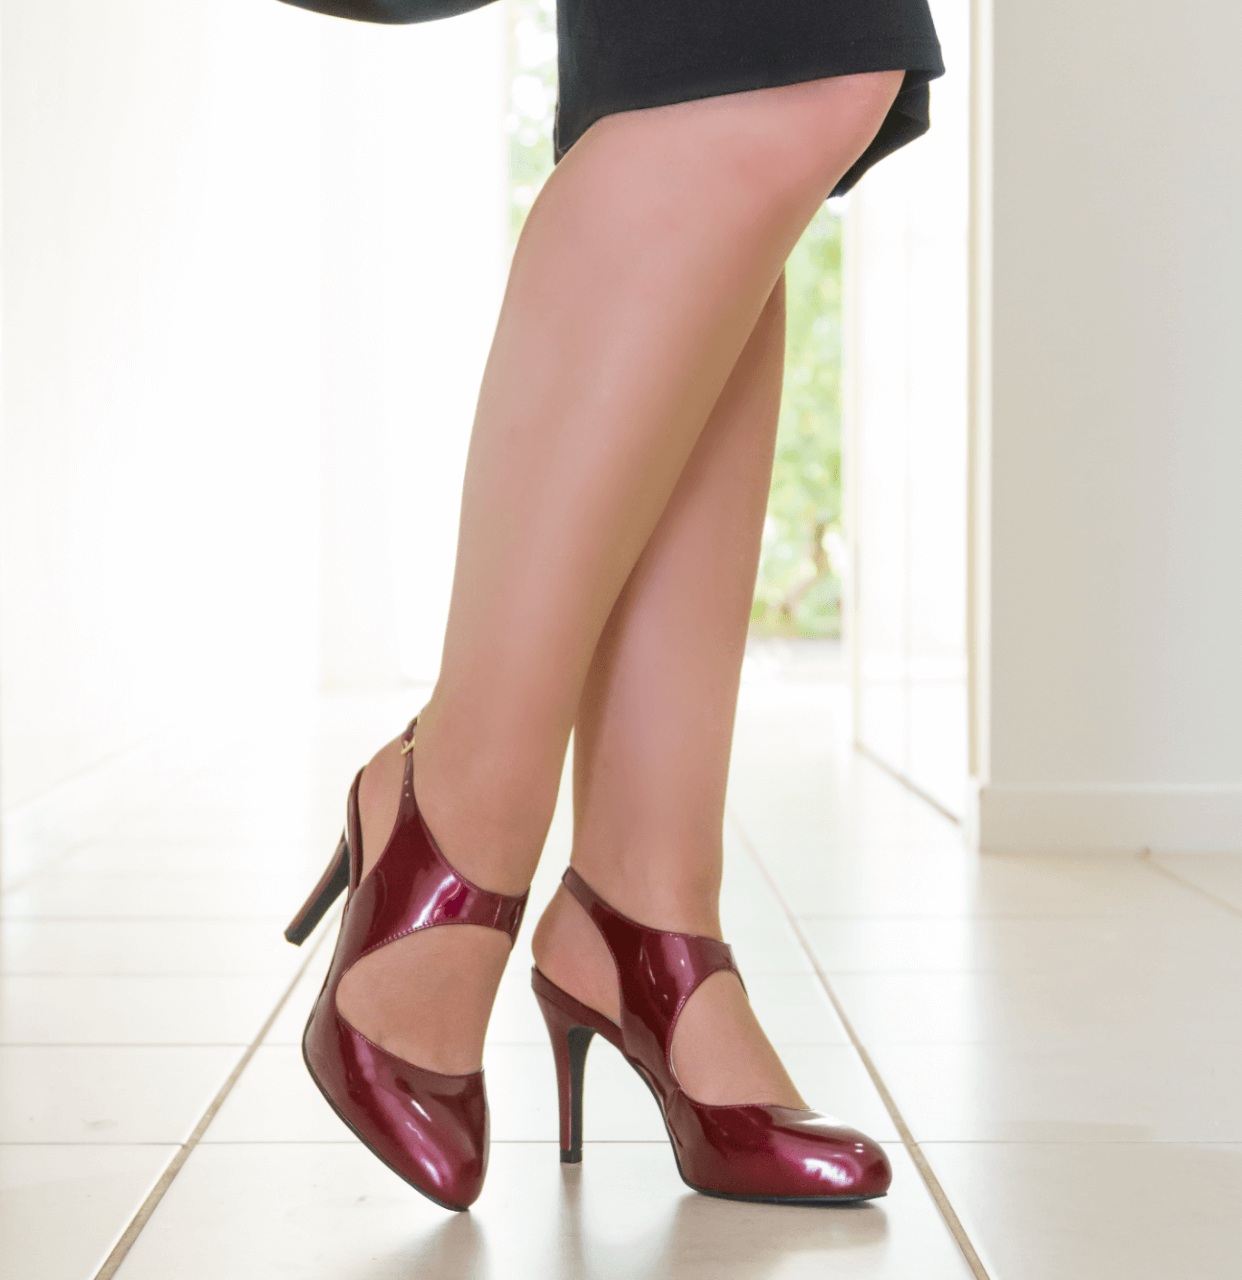 Red Mid Heel T-Bar Pump I Claret by Scarlettos